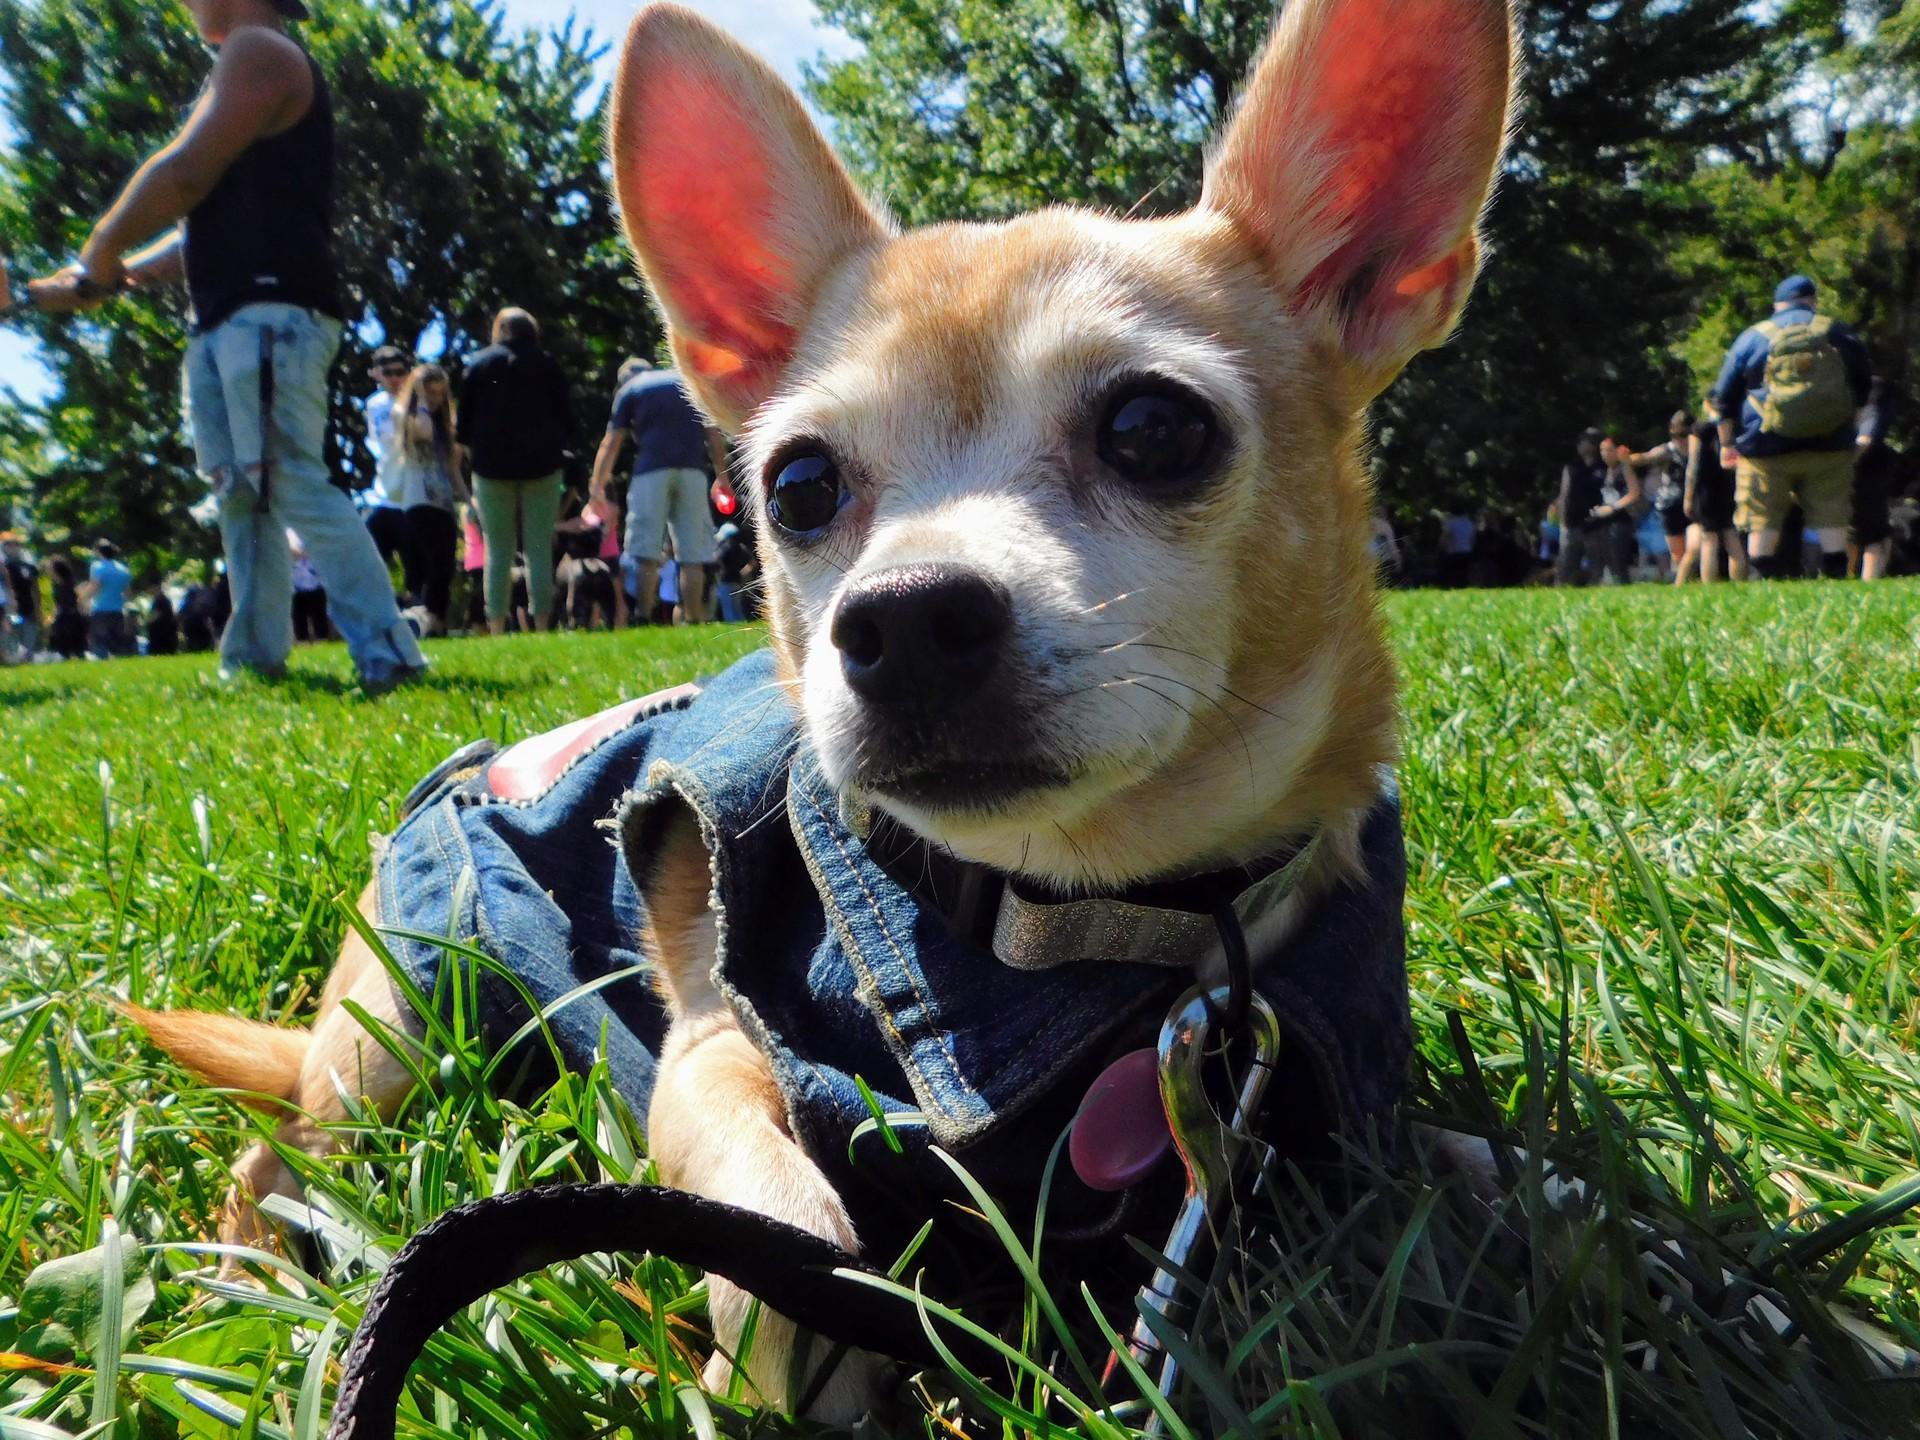 Dog days of summer | rick.cognyl.fournier, animal, canine, cute